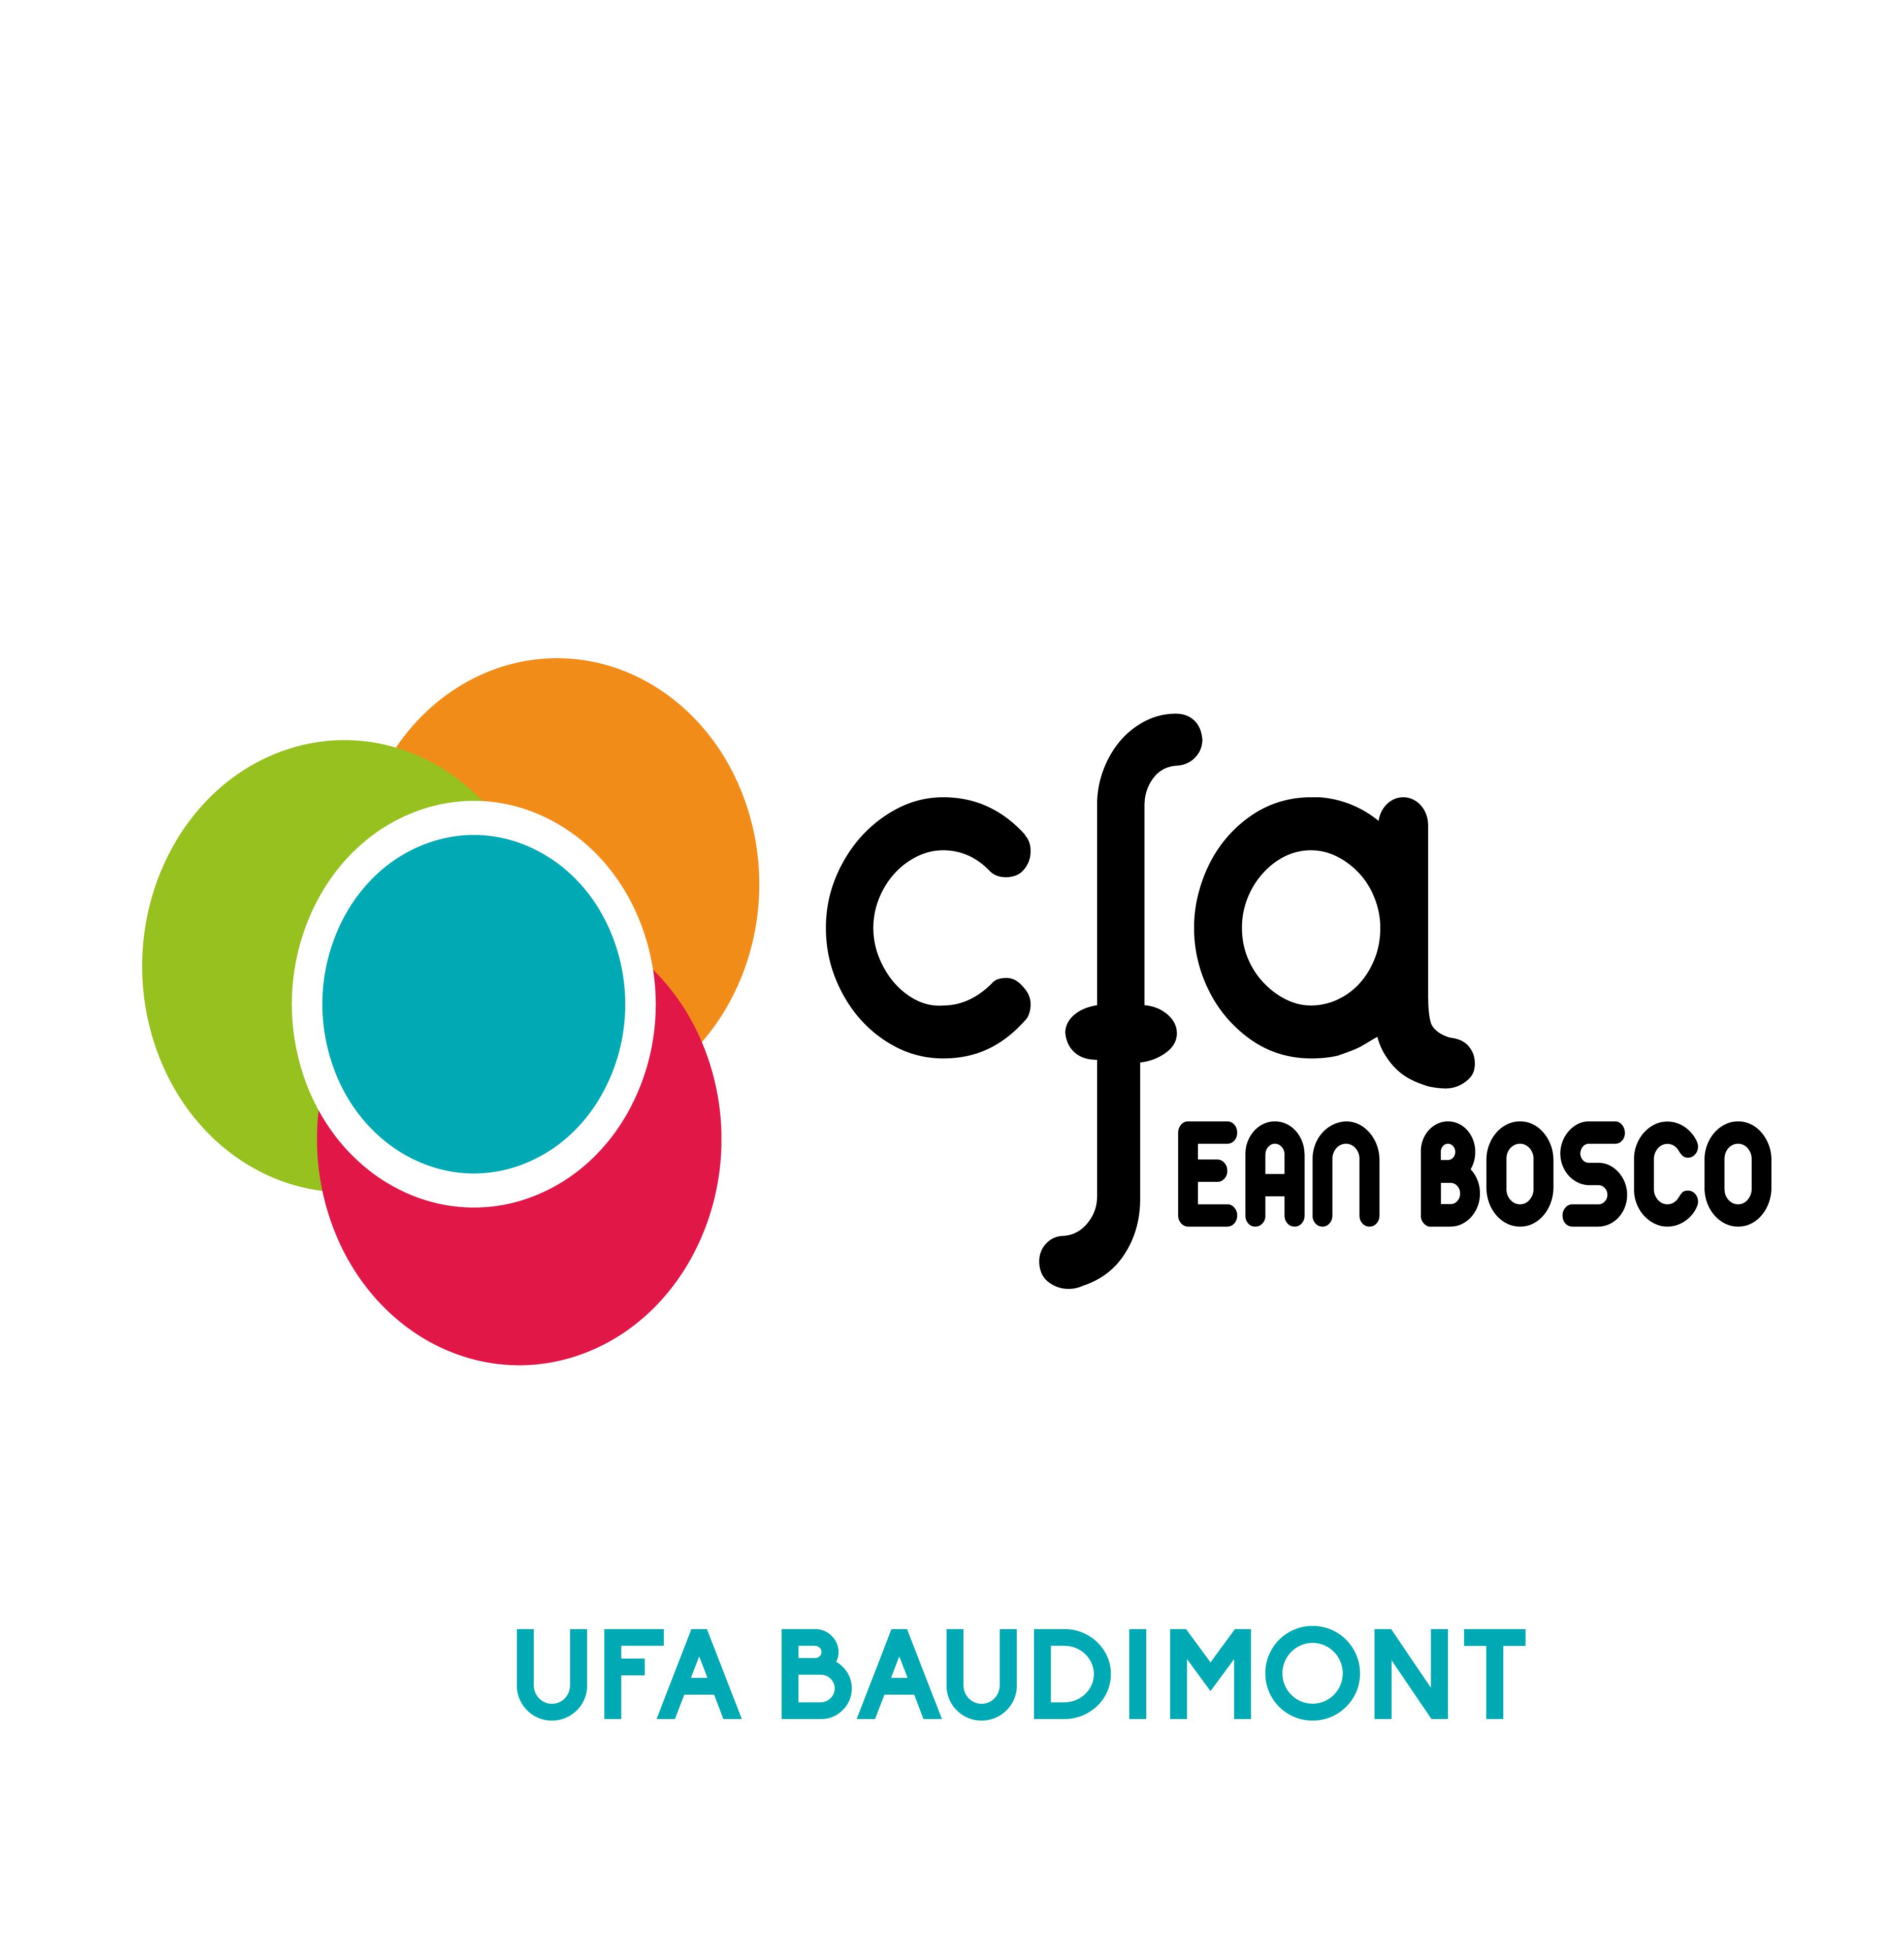 LOGO CFA-BAUDIMONT